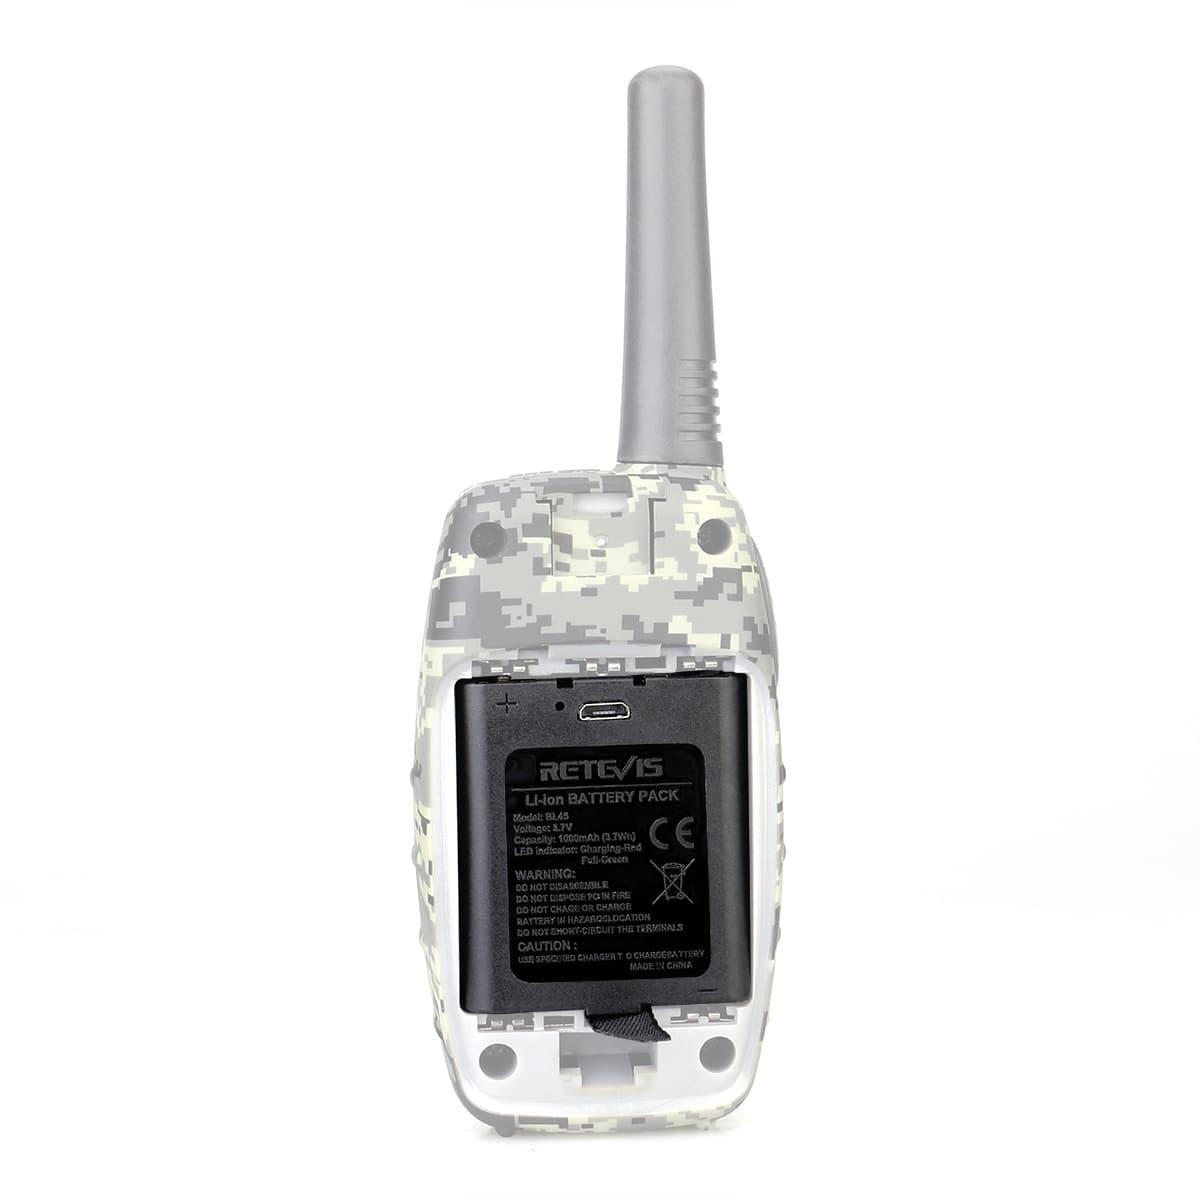 Black,2 Packs Retevis BL45 Rechargeable Battery 1000mAh USB Charging LED Indicator Li-ion Battery for Retevis RT628 RT45 Walkie Talkies